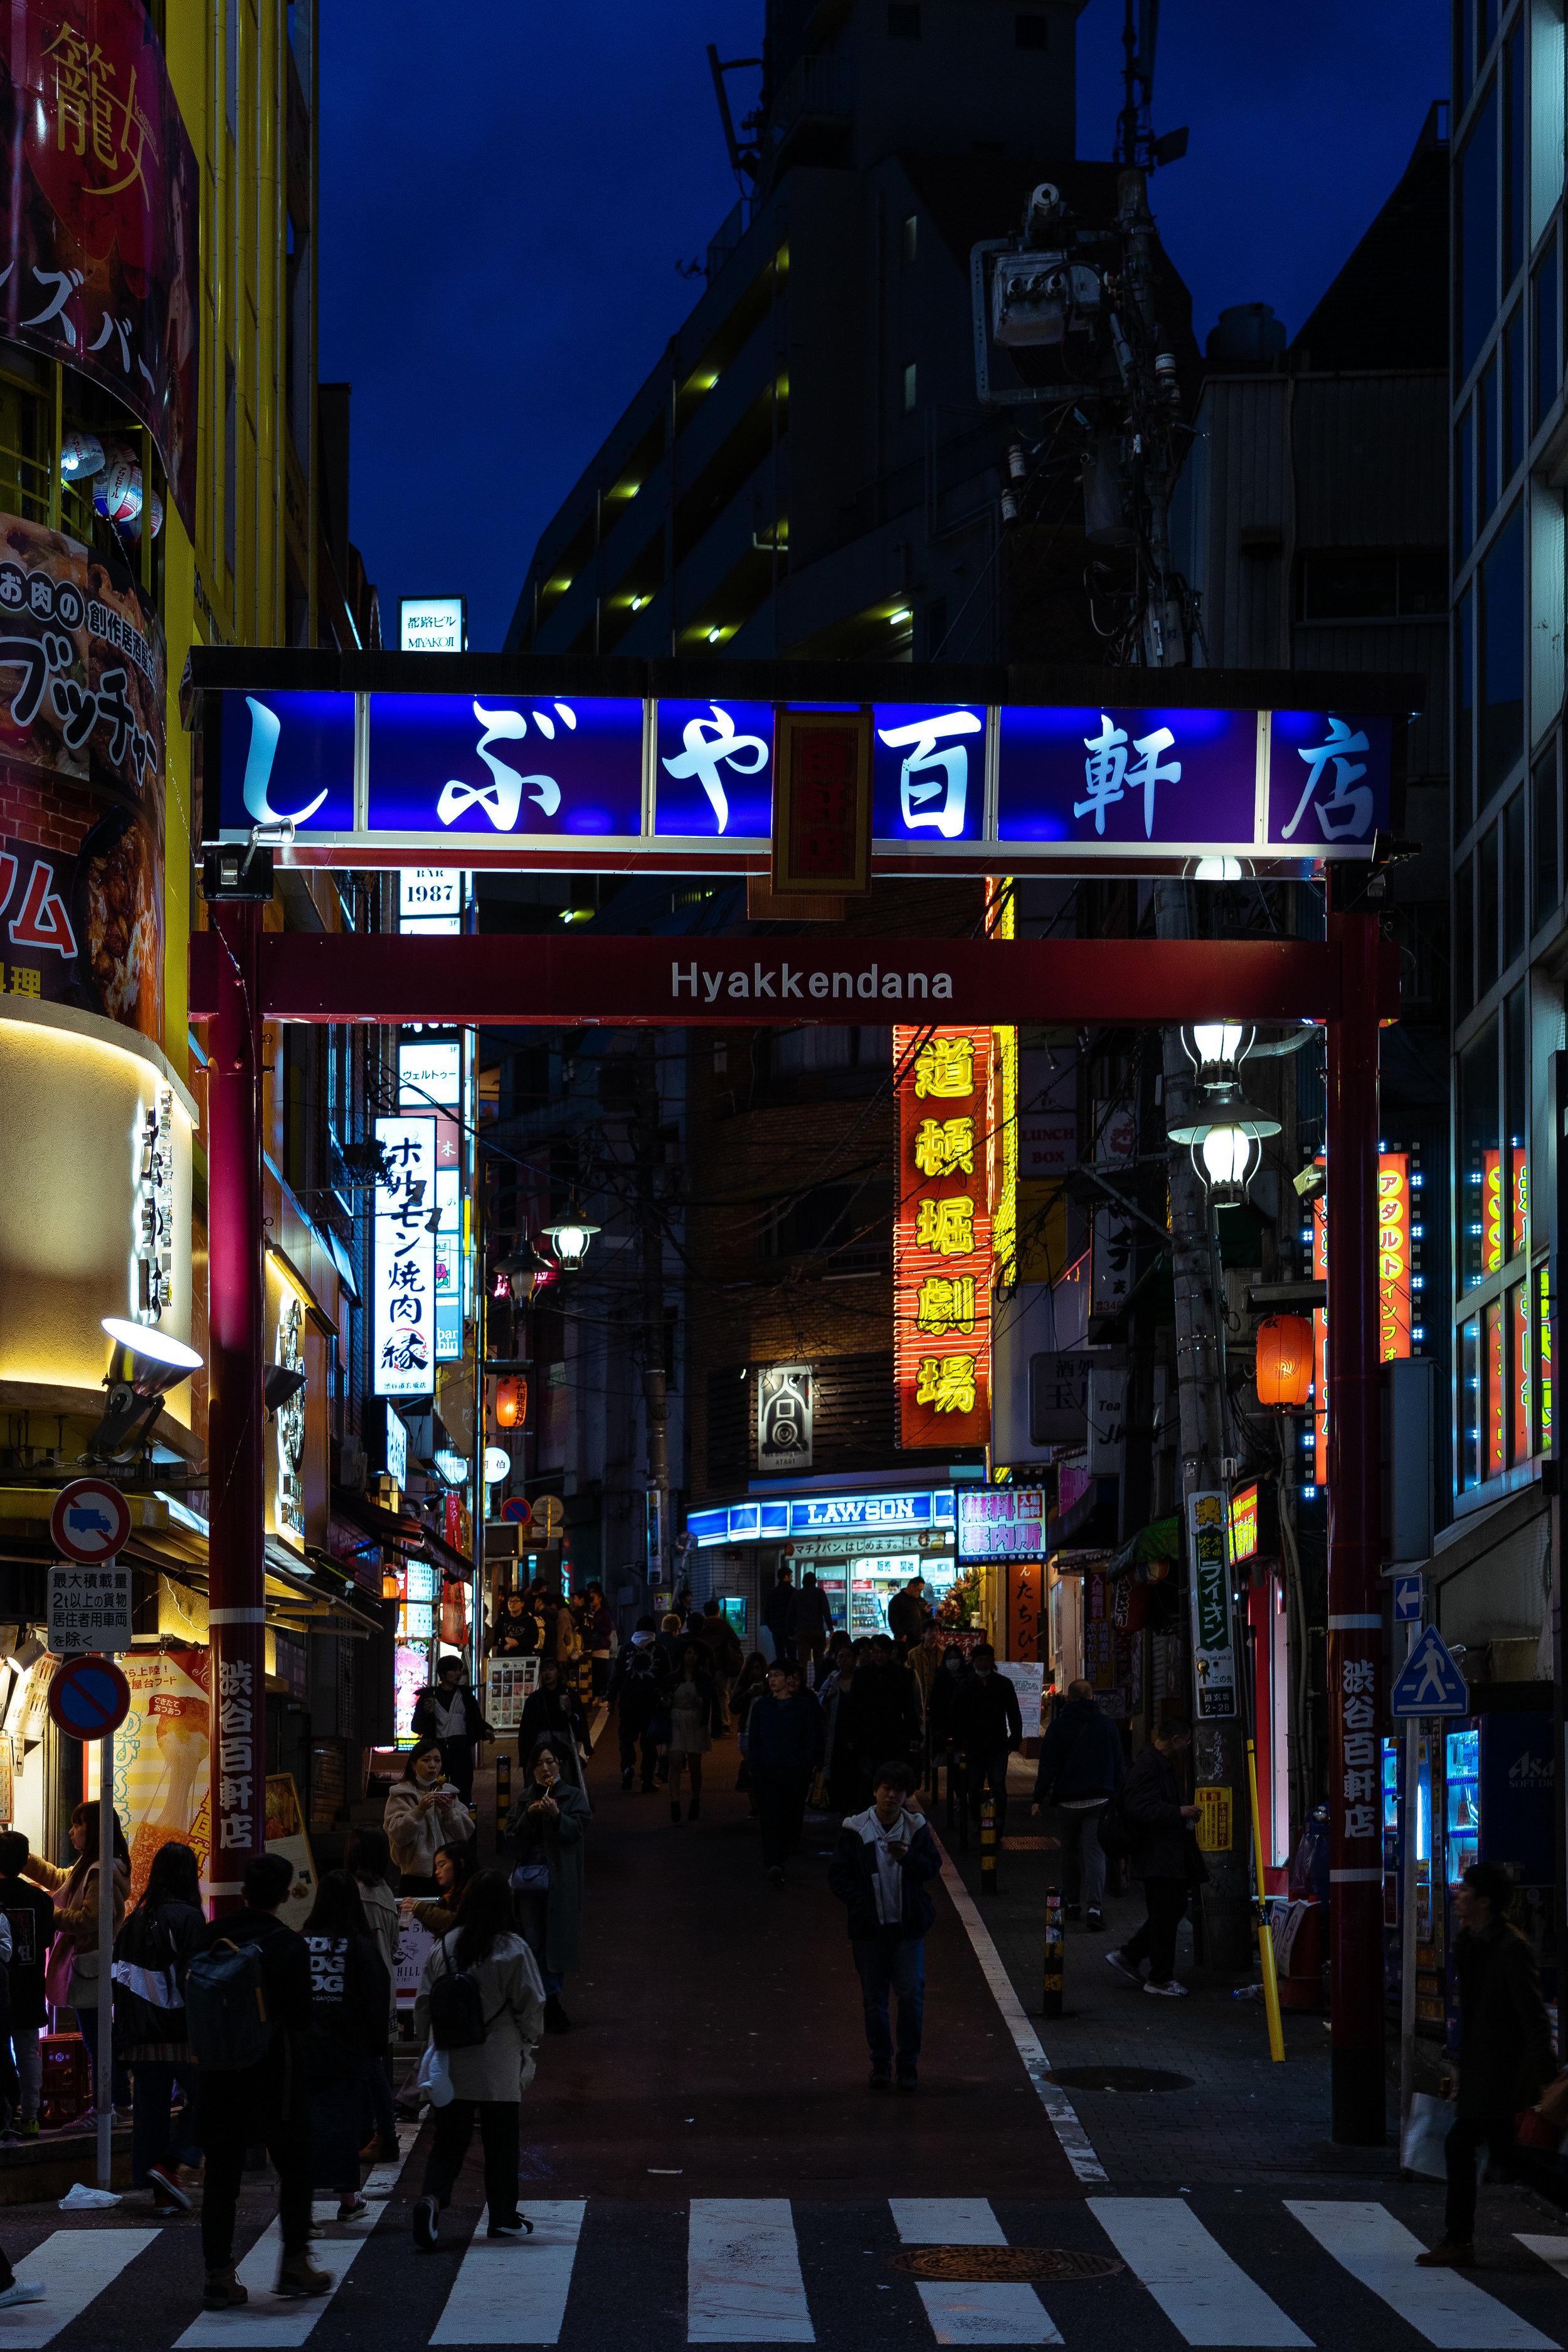 Tokyo Hyakkendana.jpg